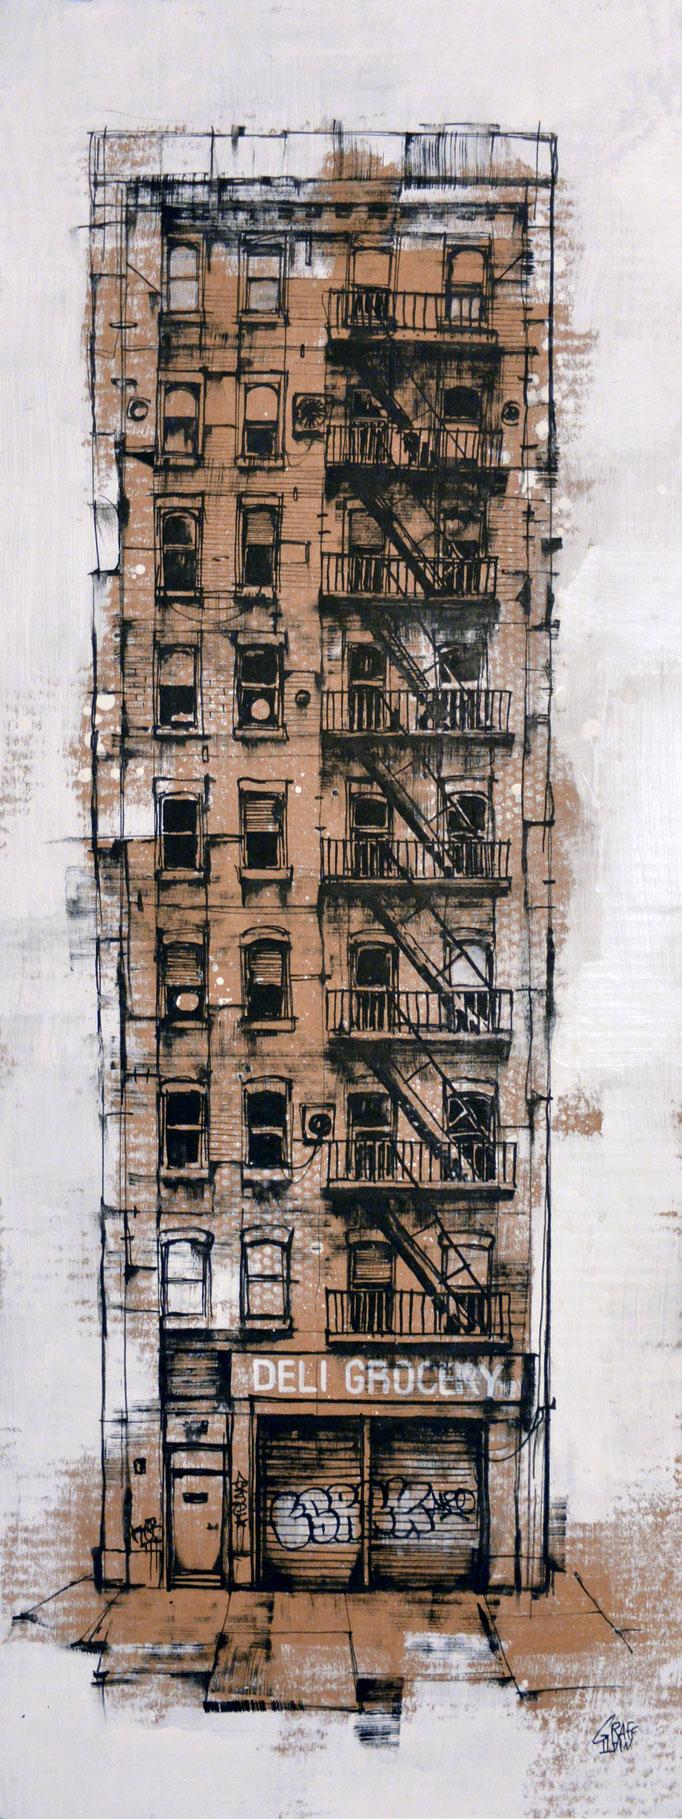 "<b>DELI GROCERY</b><br>80 x 30 cm<br><a style=""color:#db6464;"">Vendu </a> <alt=""art peinture ville newyork facade urbaine"">"